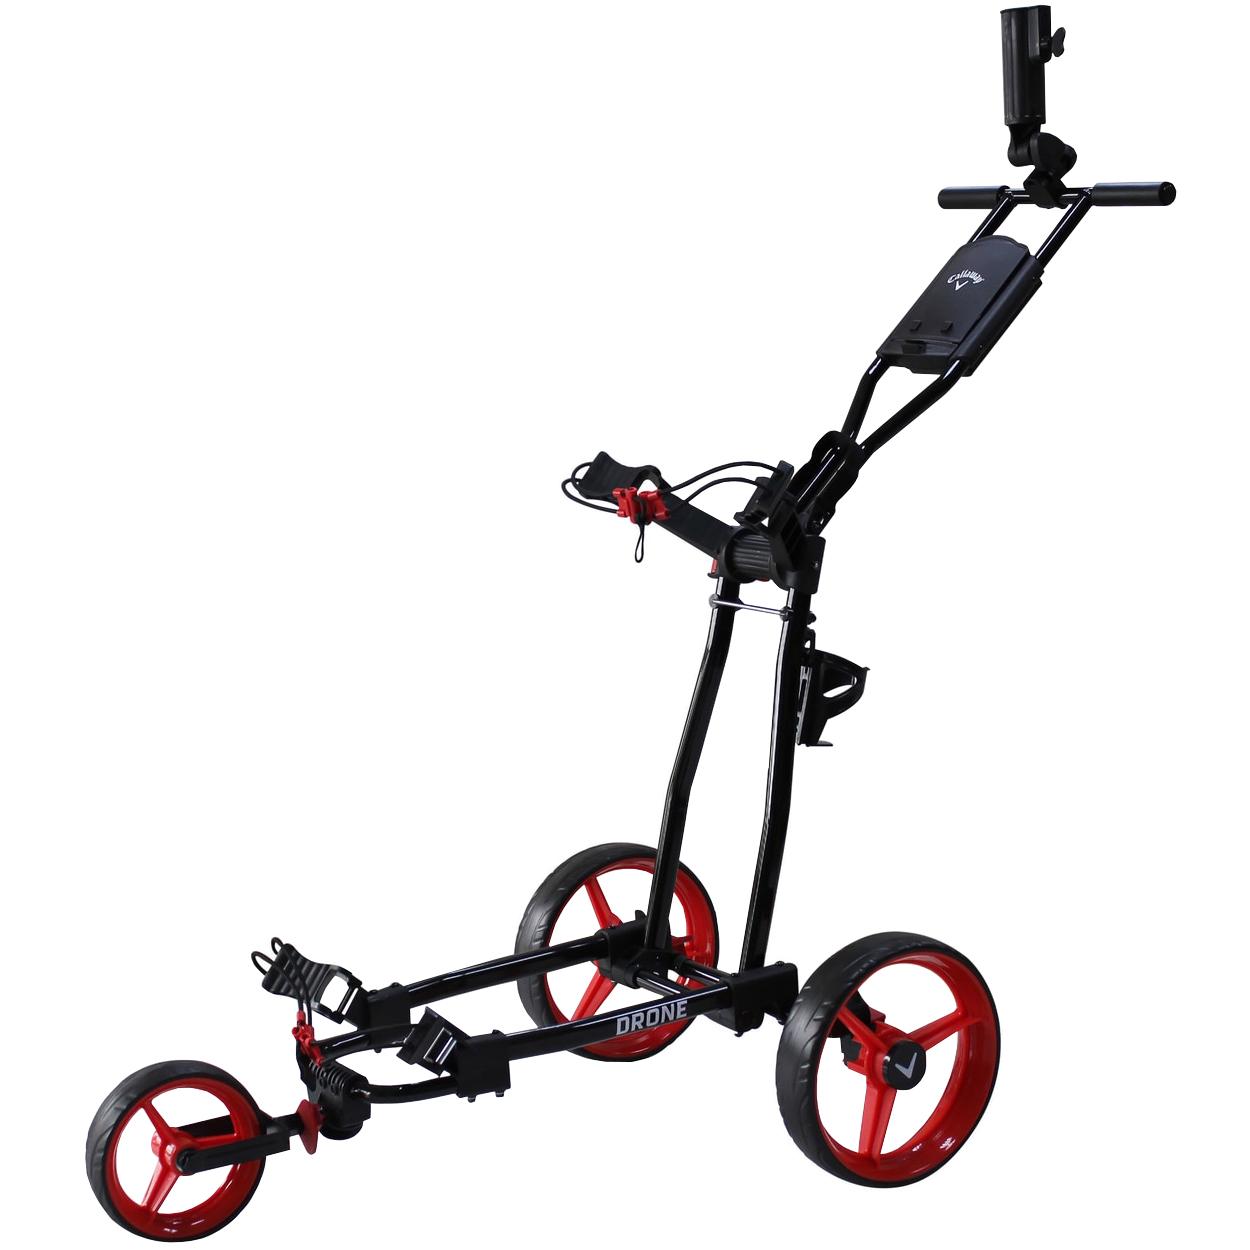 Callaway Golf Drone 3-Wheel...